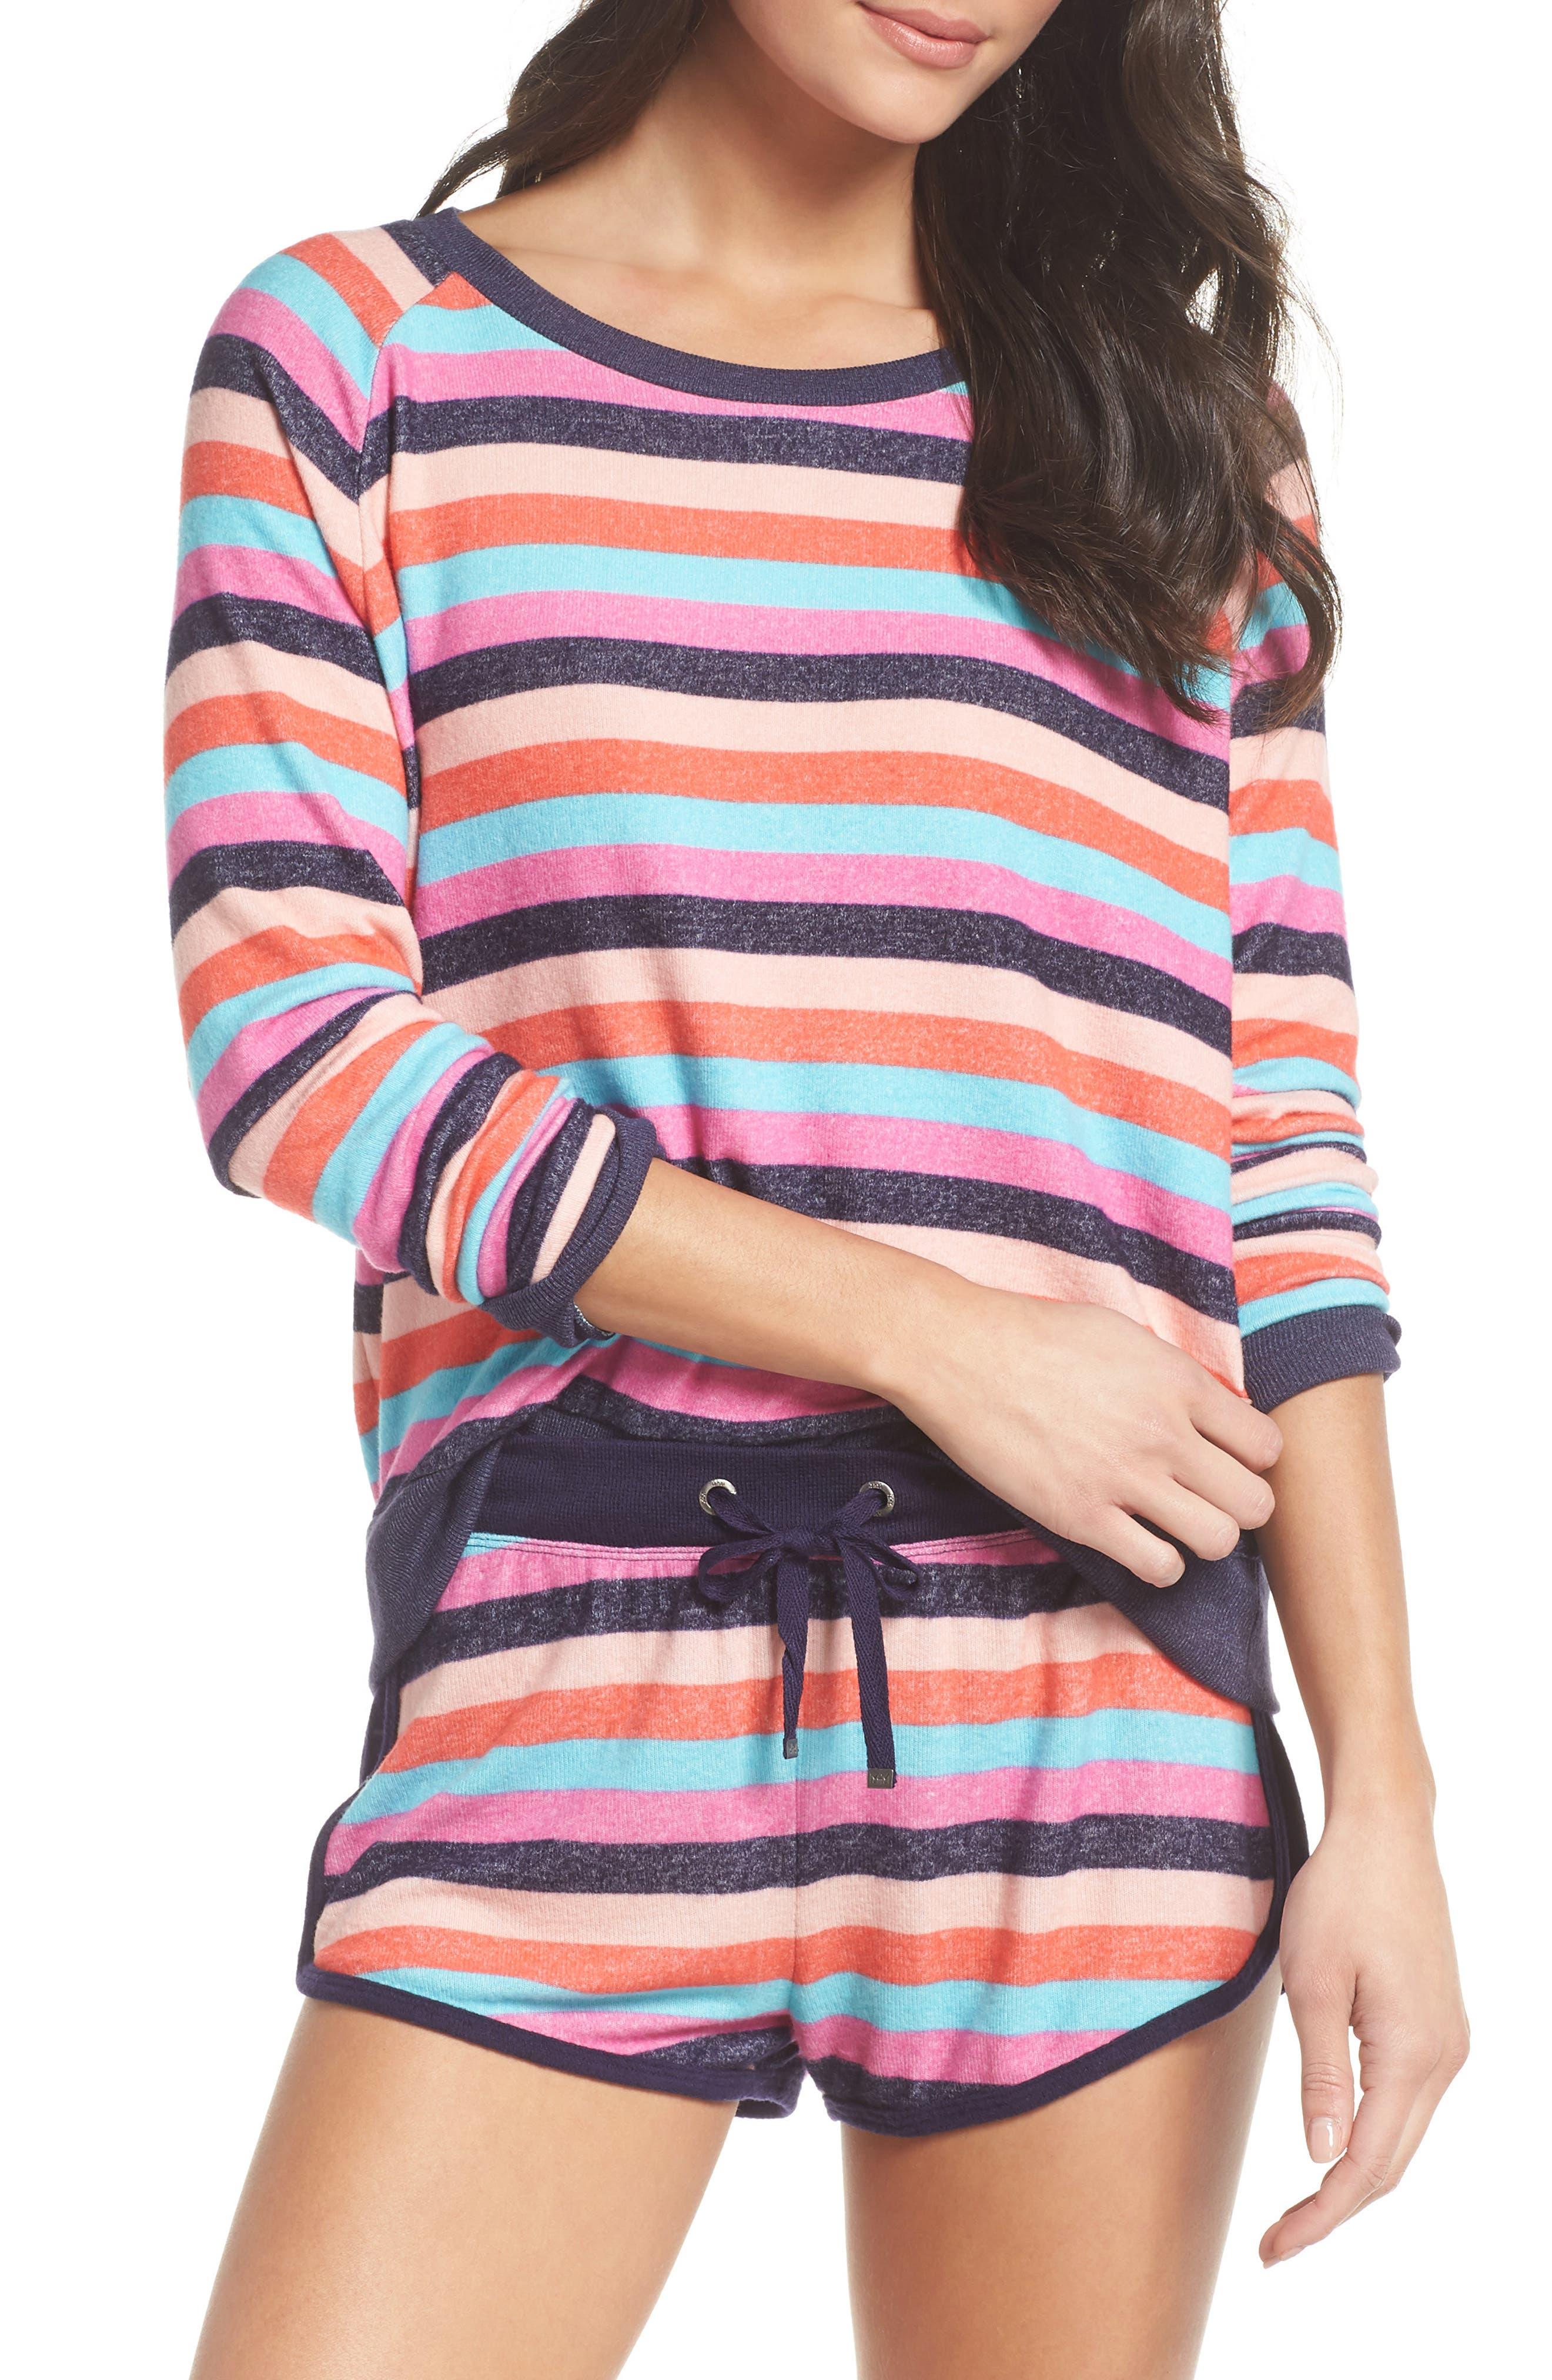 Cozy Crew Raglan Sweatshirt,                         Main,                         color, Navy Dusk Milli Multi Stripe